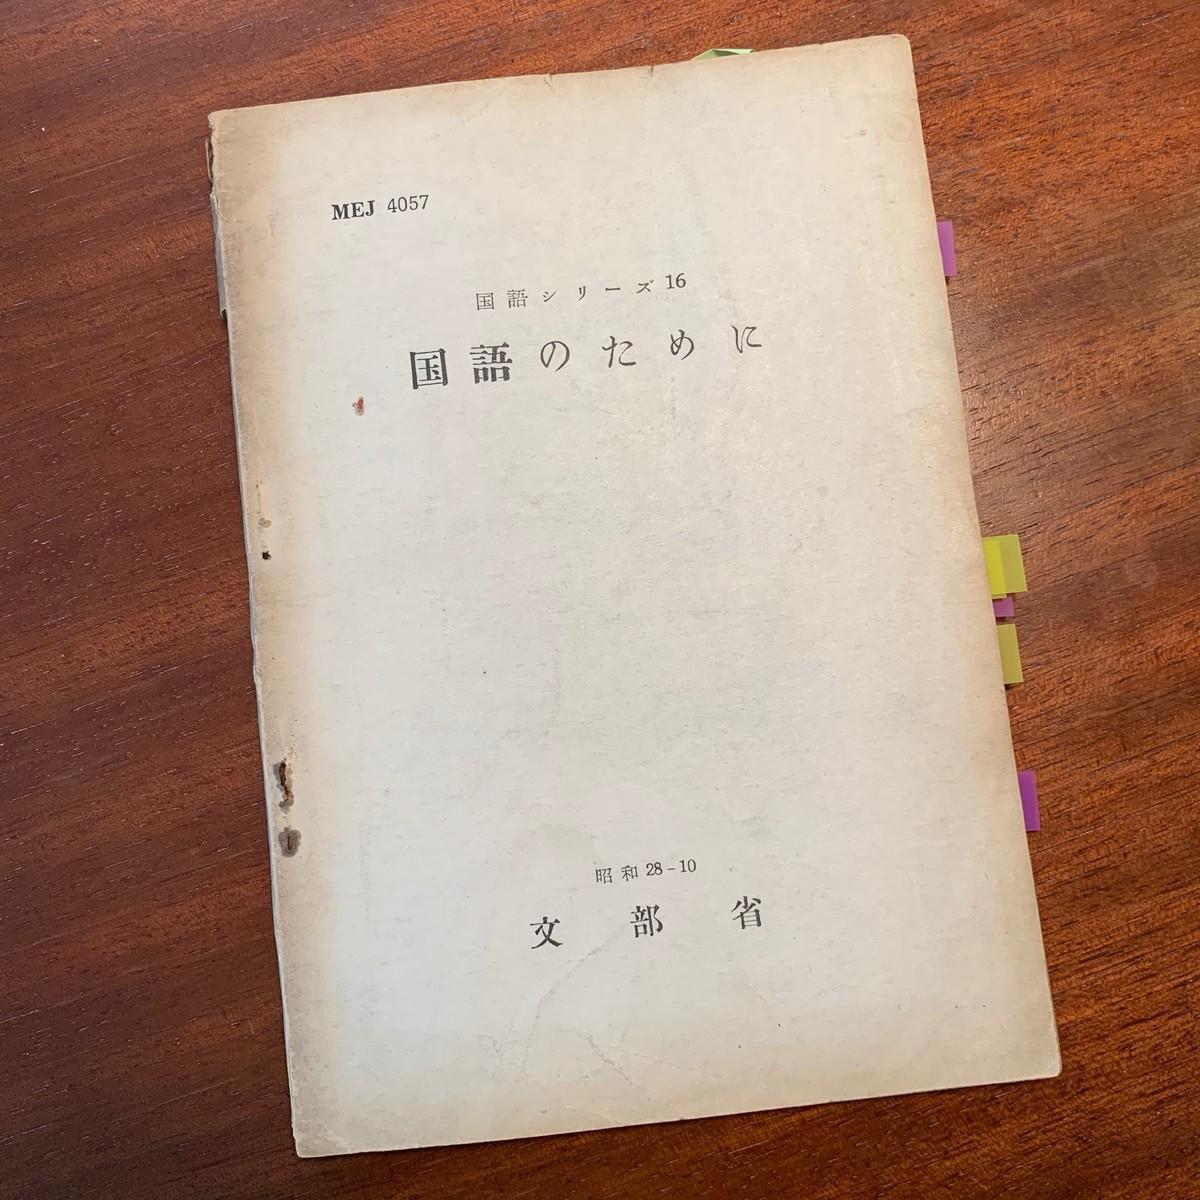 f:id:QianChong:20200105094227j:plain:w300